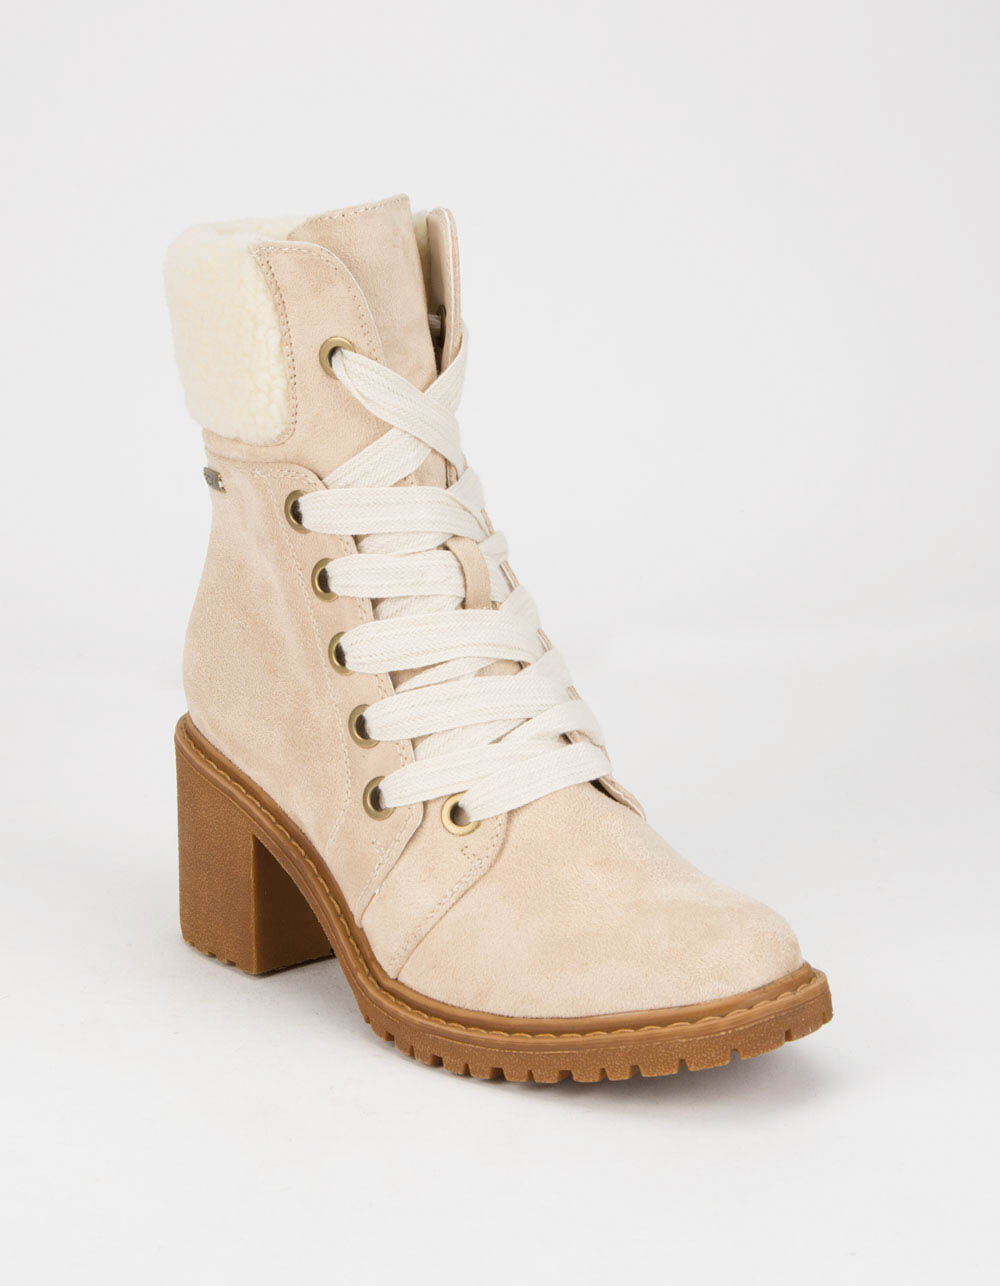 ROXY Eddy Heeled Lace-Up Natural Lug Boots